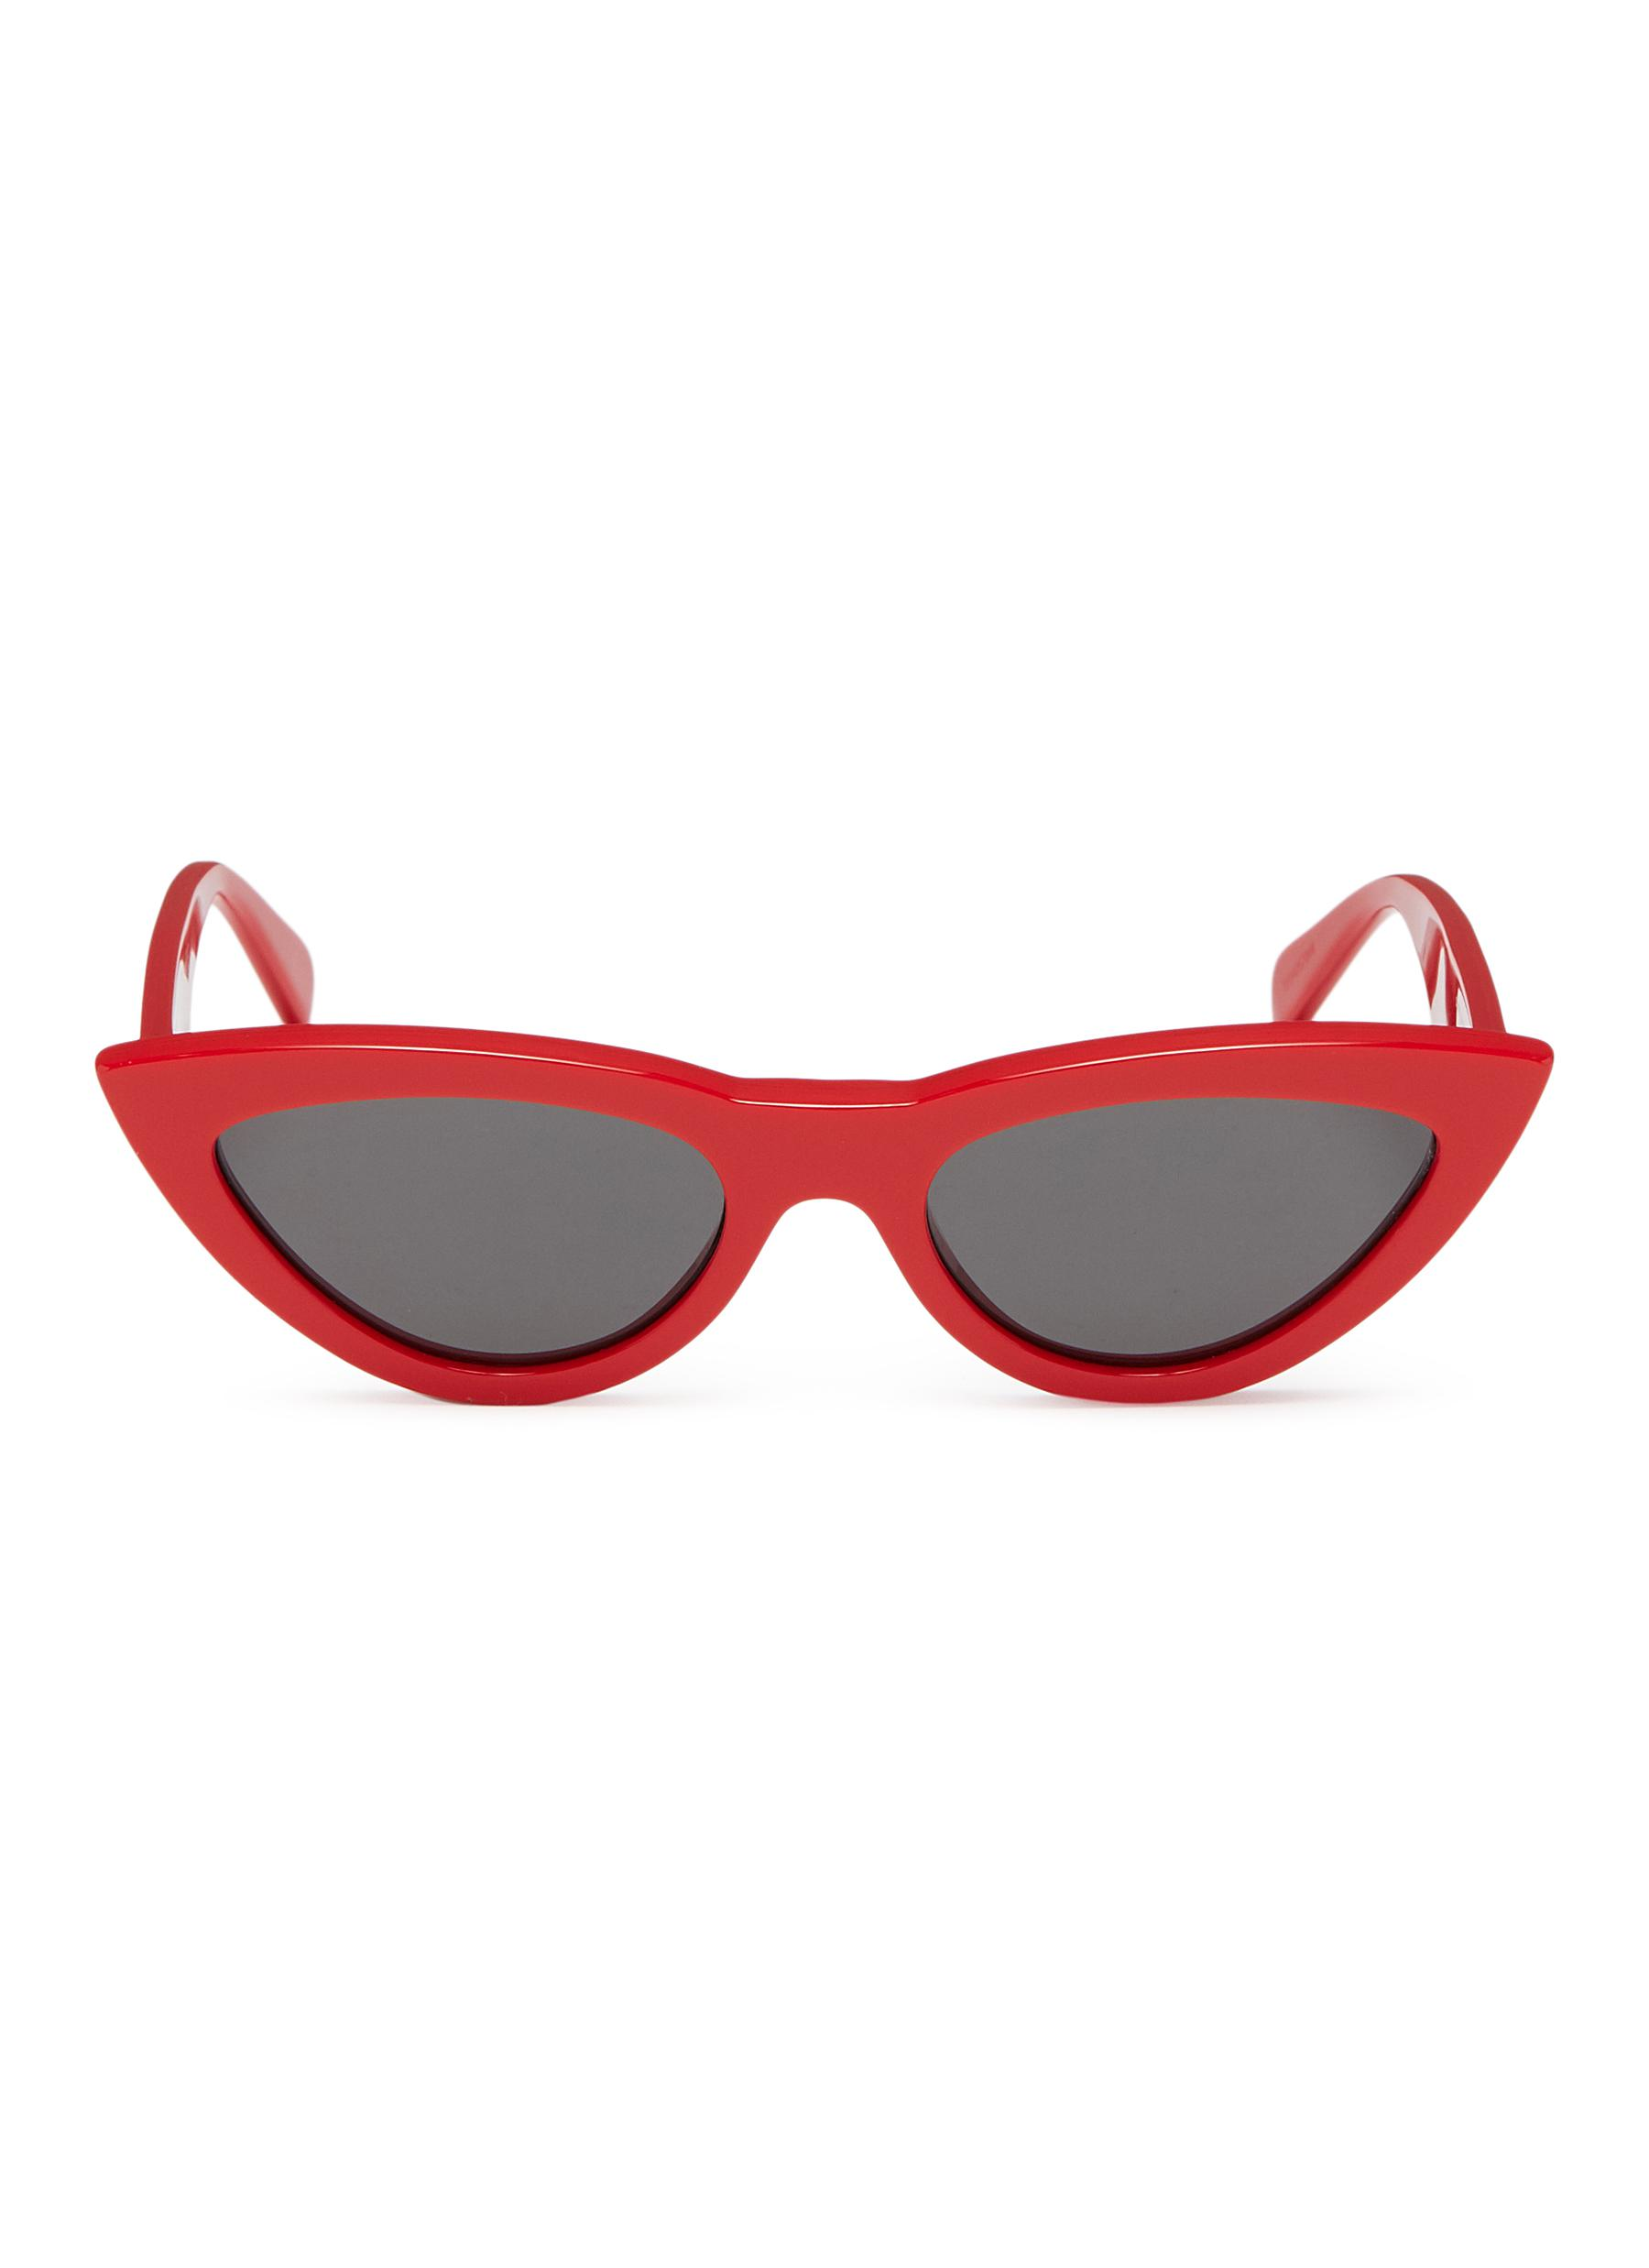 d13c6bf797e Main View - Click To Enlarge - Céline - Acetate narrow cat eye sunglasses